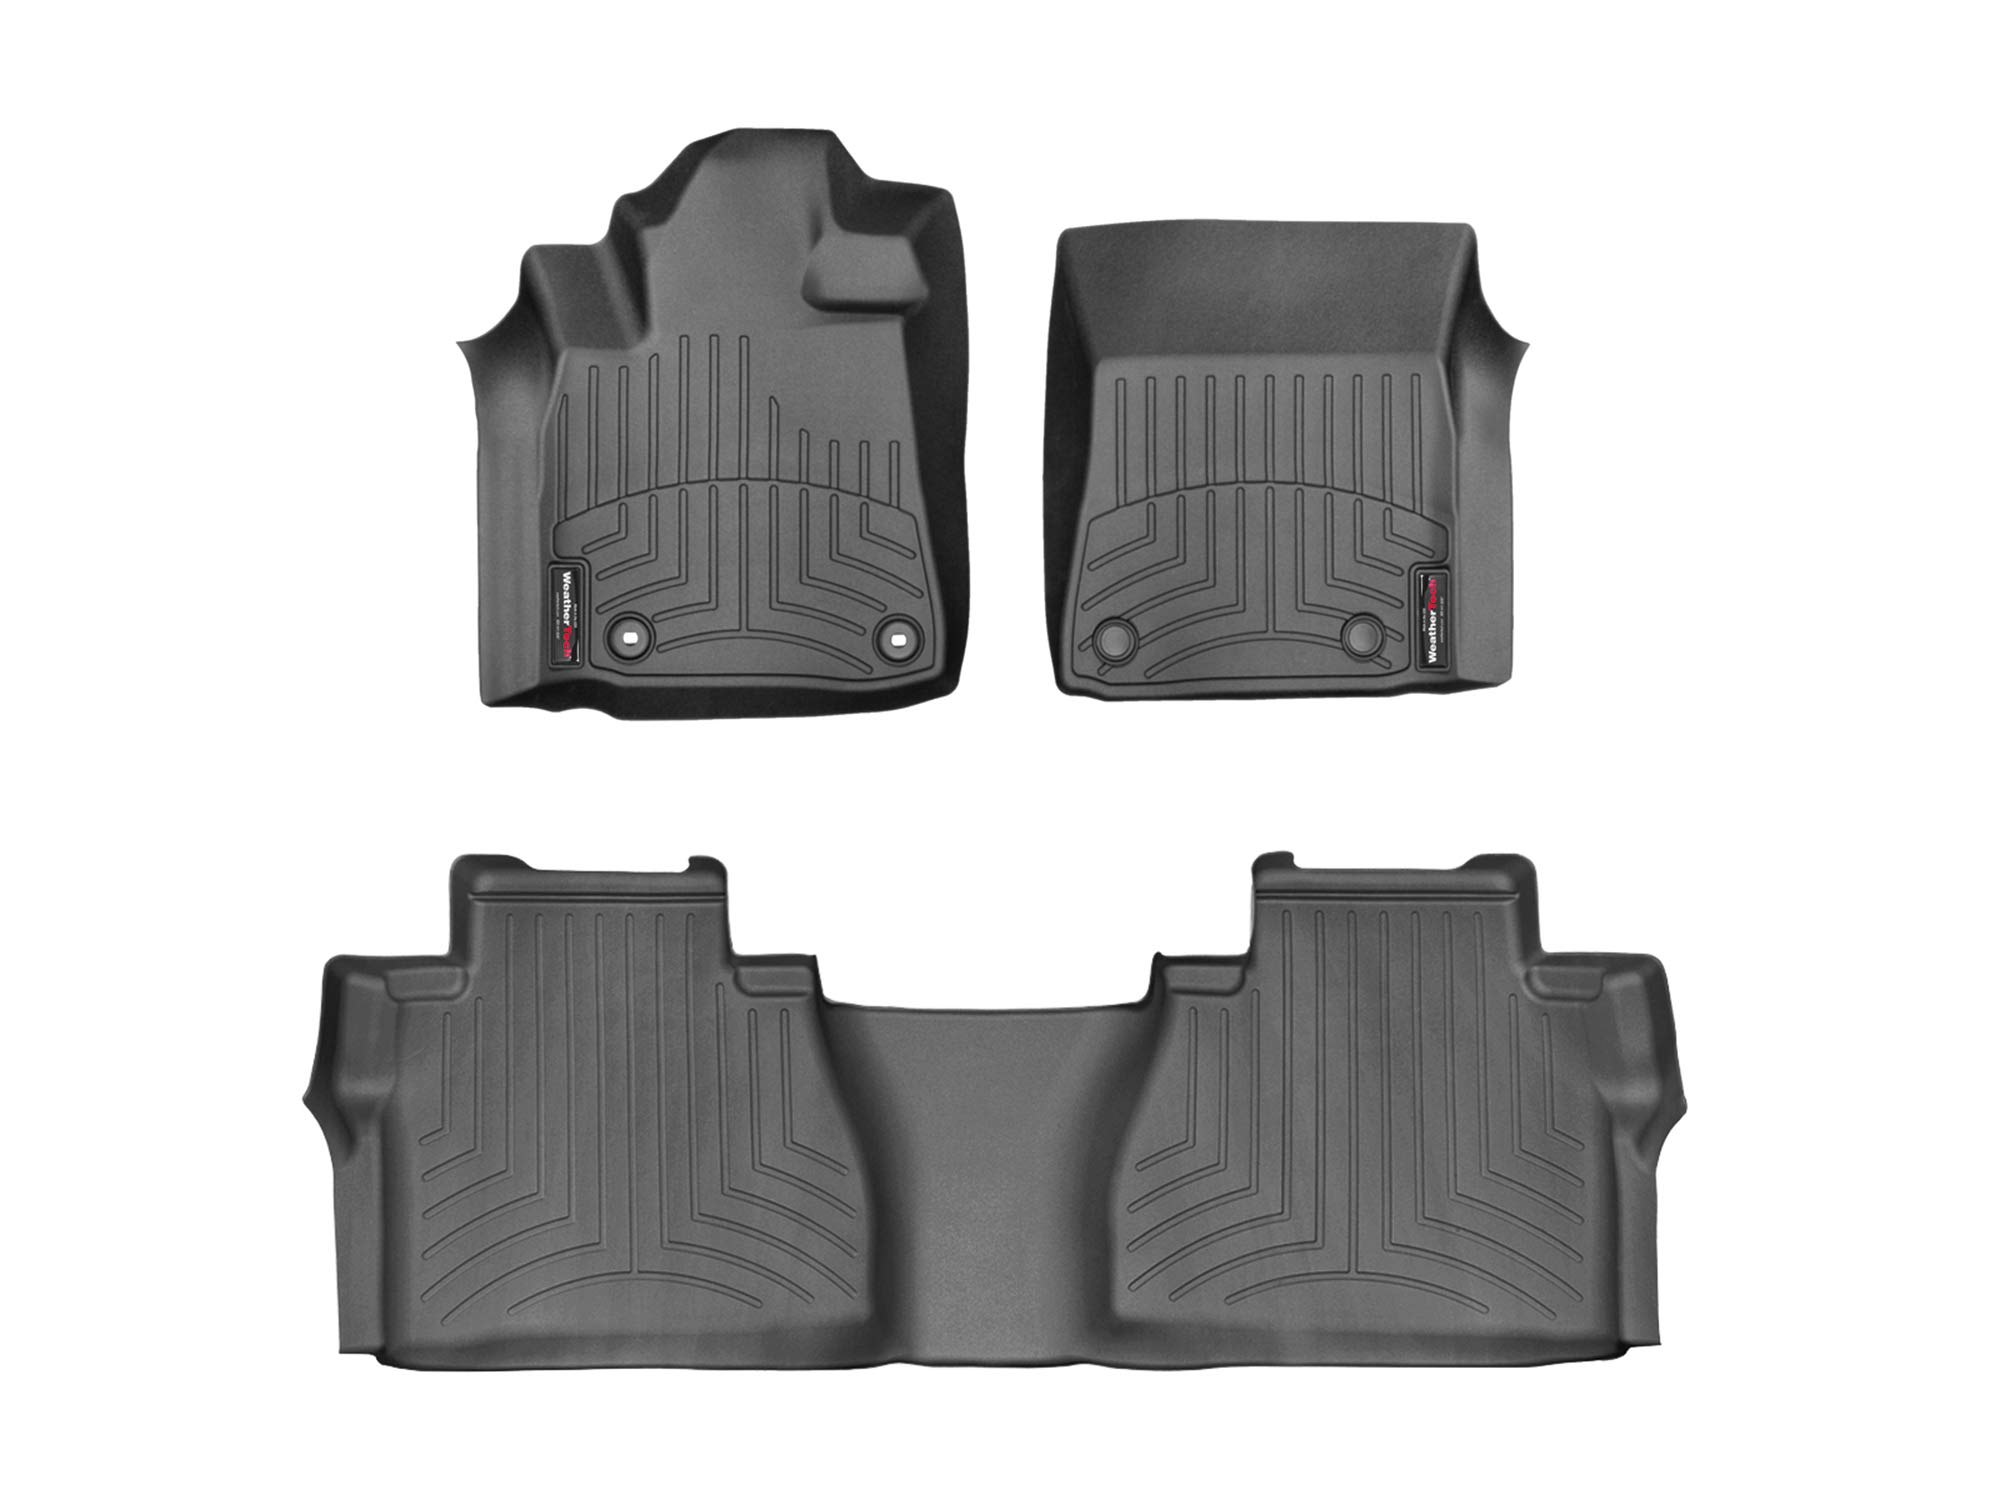 WeatherTech Custom Fit FloorLiner for Toyota Tundra - 1st & 2nd Row (Black)